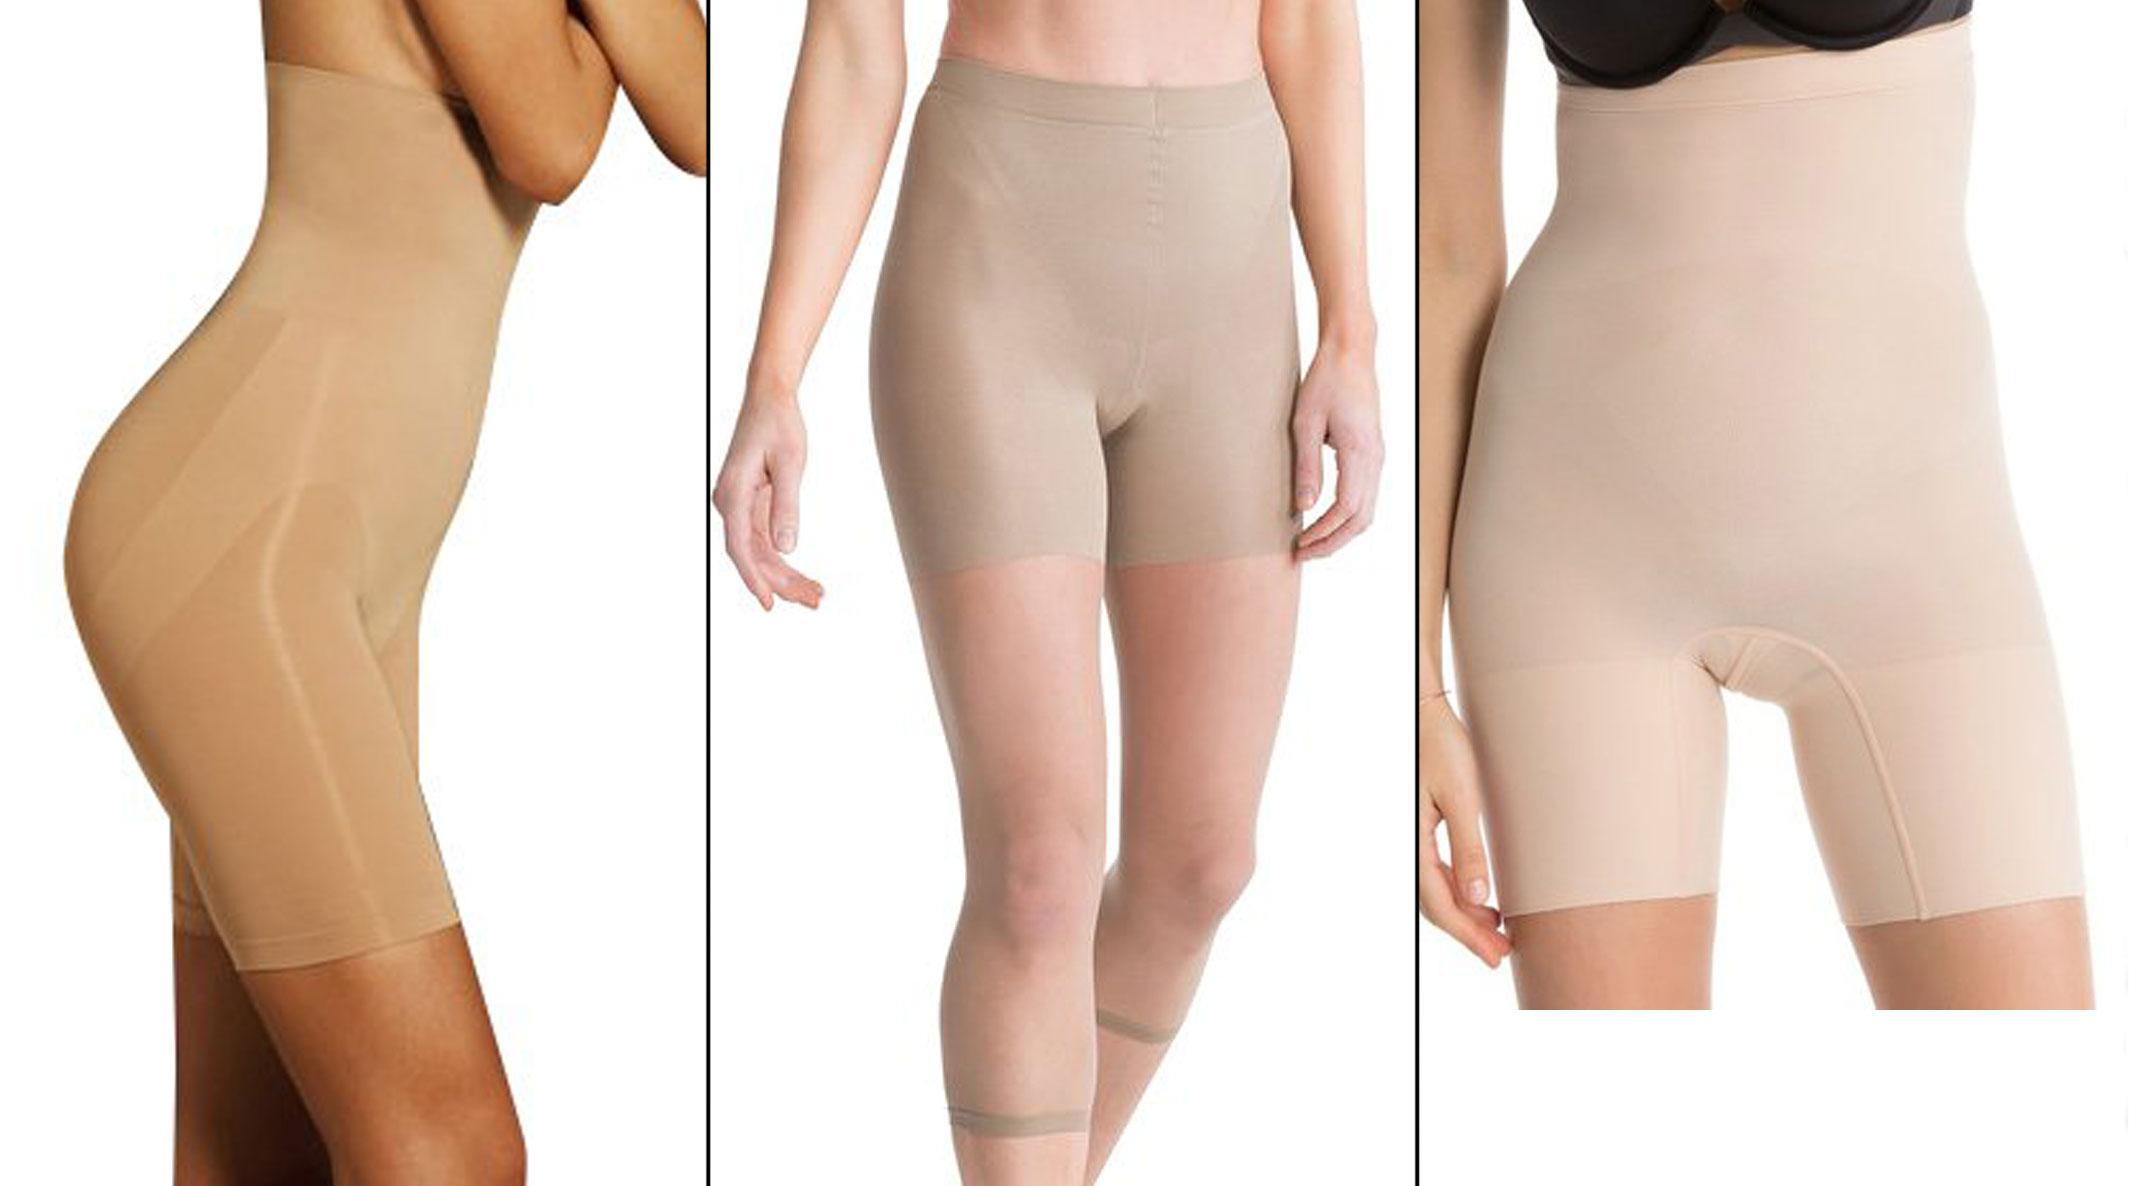 eb3c8617a2 Kim Kardashian Wears Two Body Slimmers at a Time